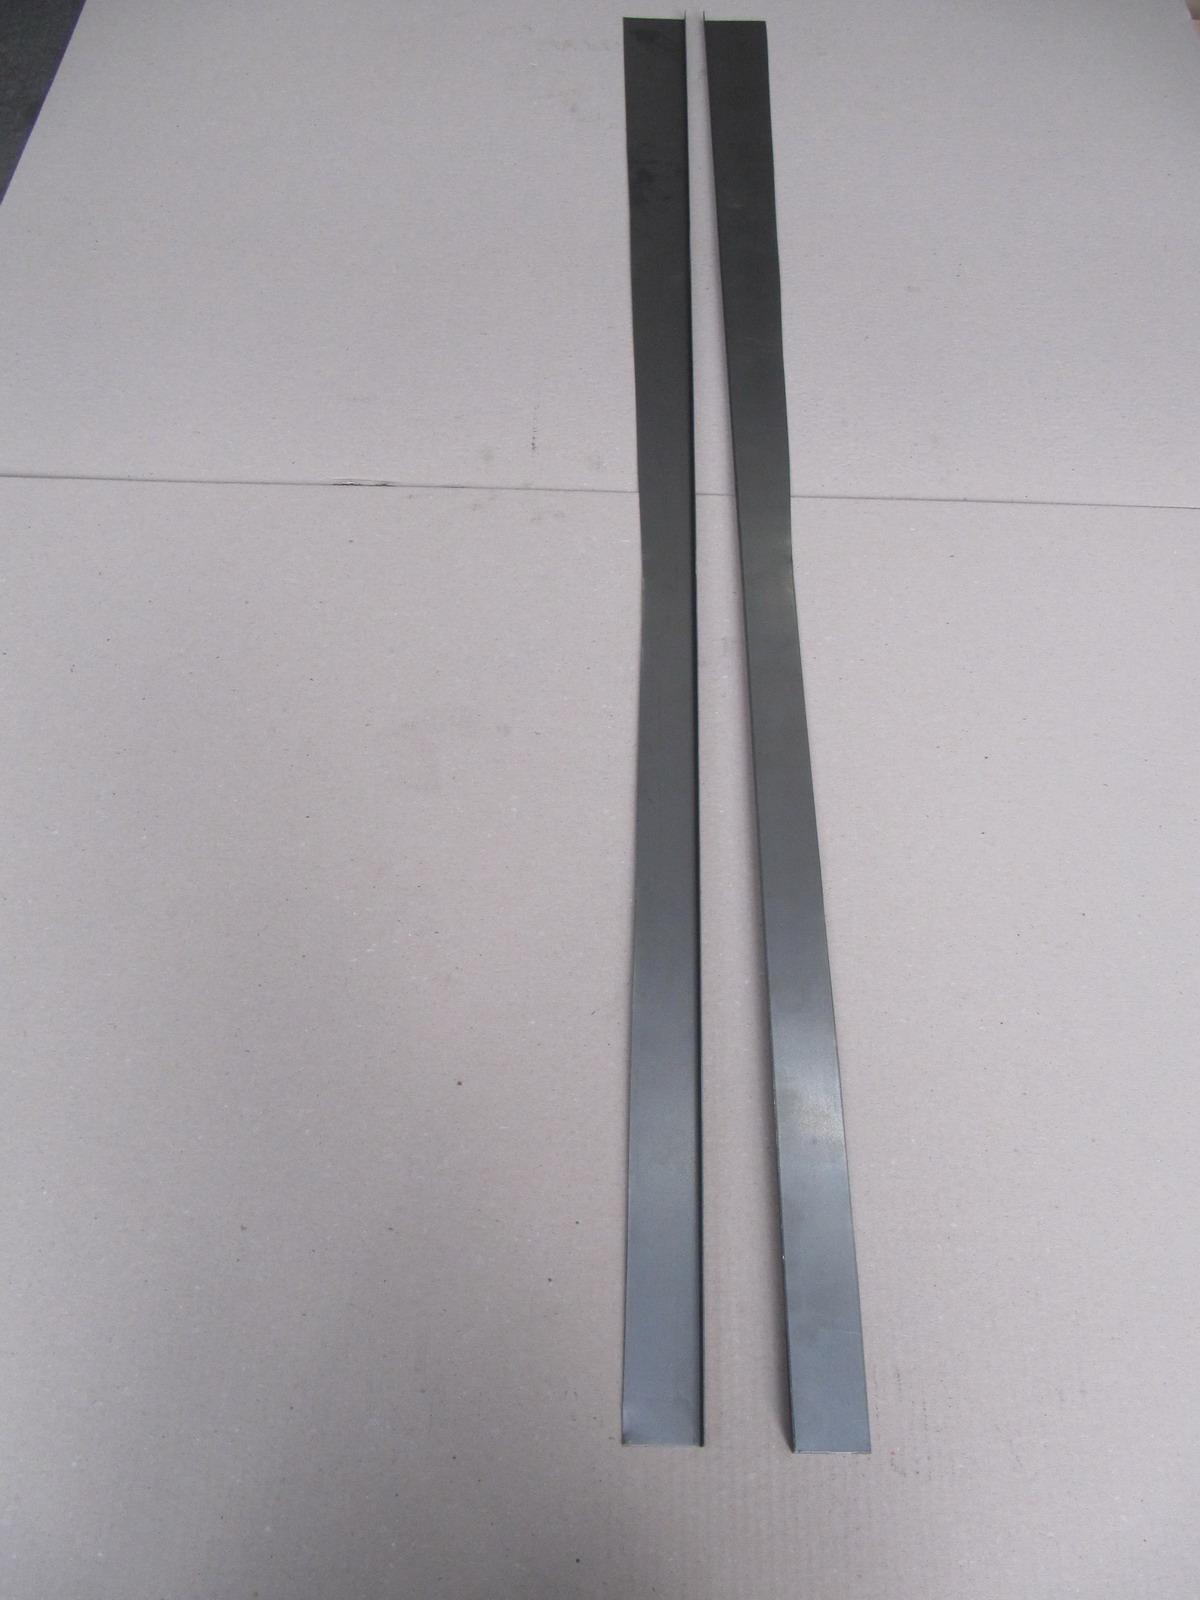 CAV2393 - COUPLE SIDE ANGULAR FLOOR SHEETS AURELIA B20